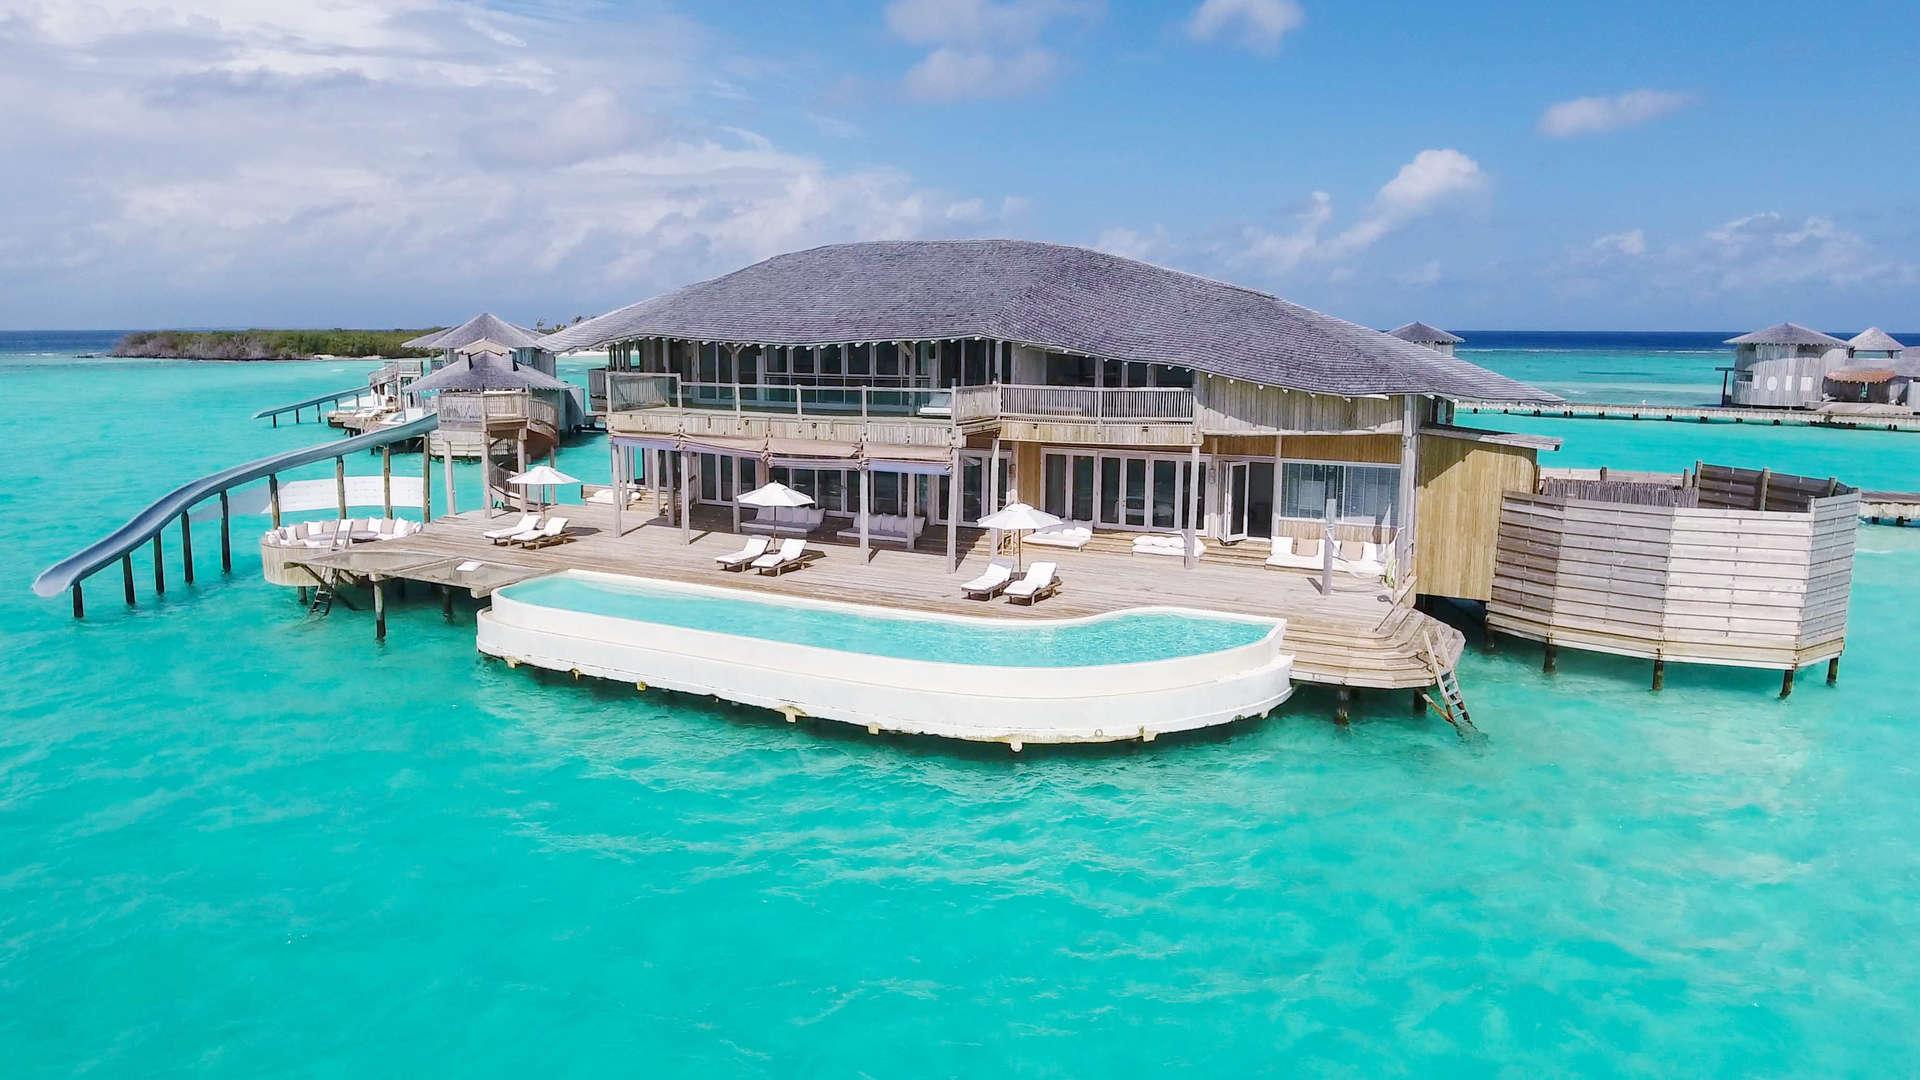 Luxury villa rentals asia - Maldives - Medhufaru island - Soneva jani resort - 4 BDM Water Reserve with Slide - Image 1/16